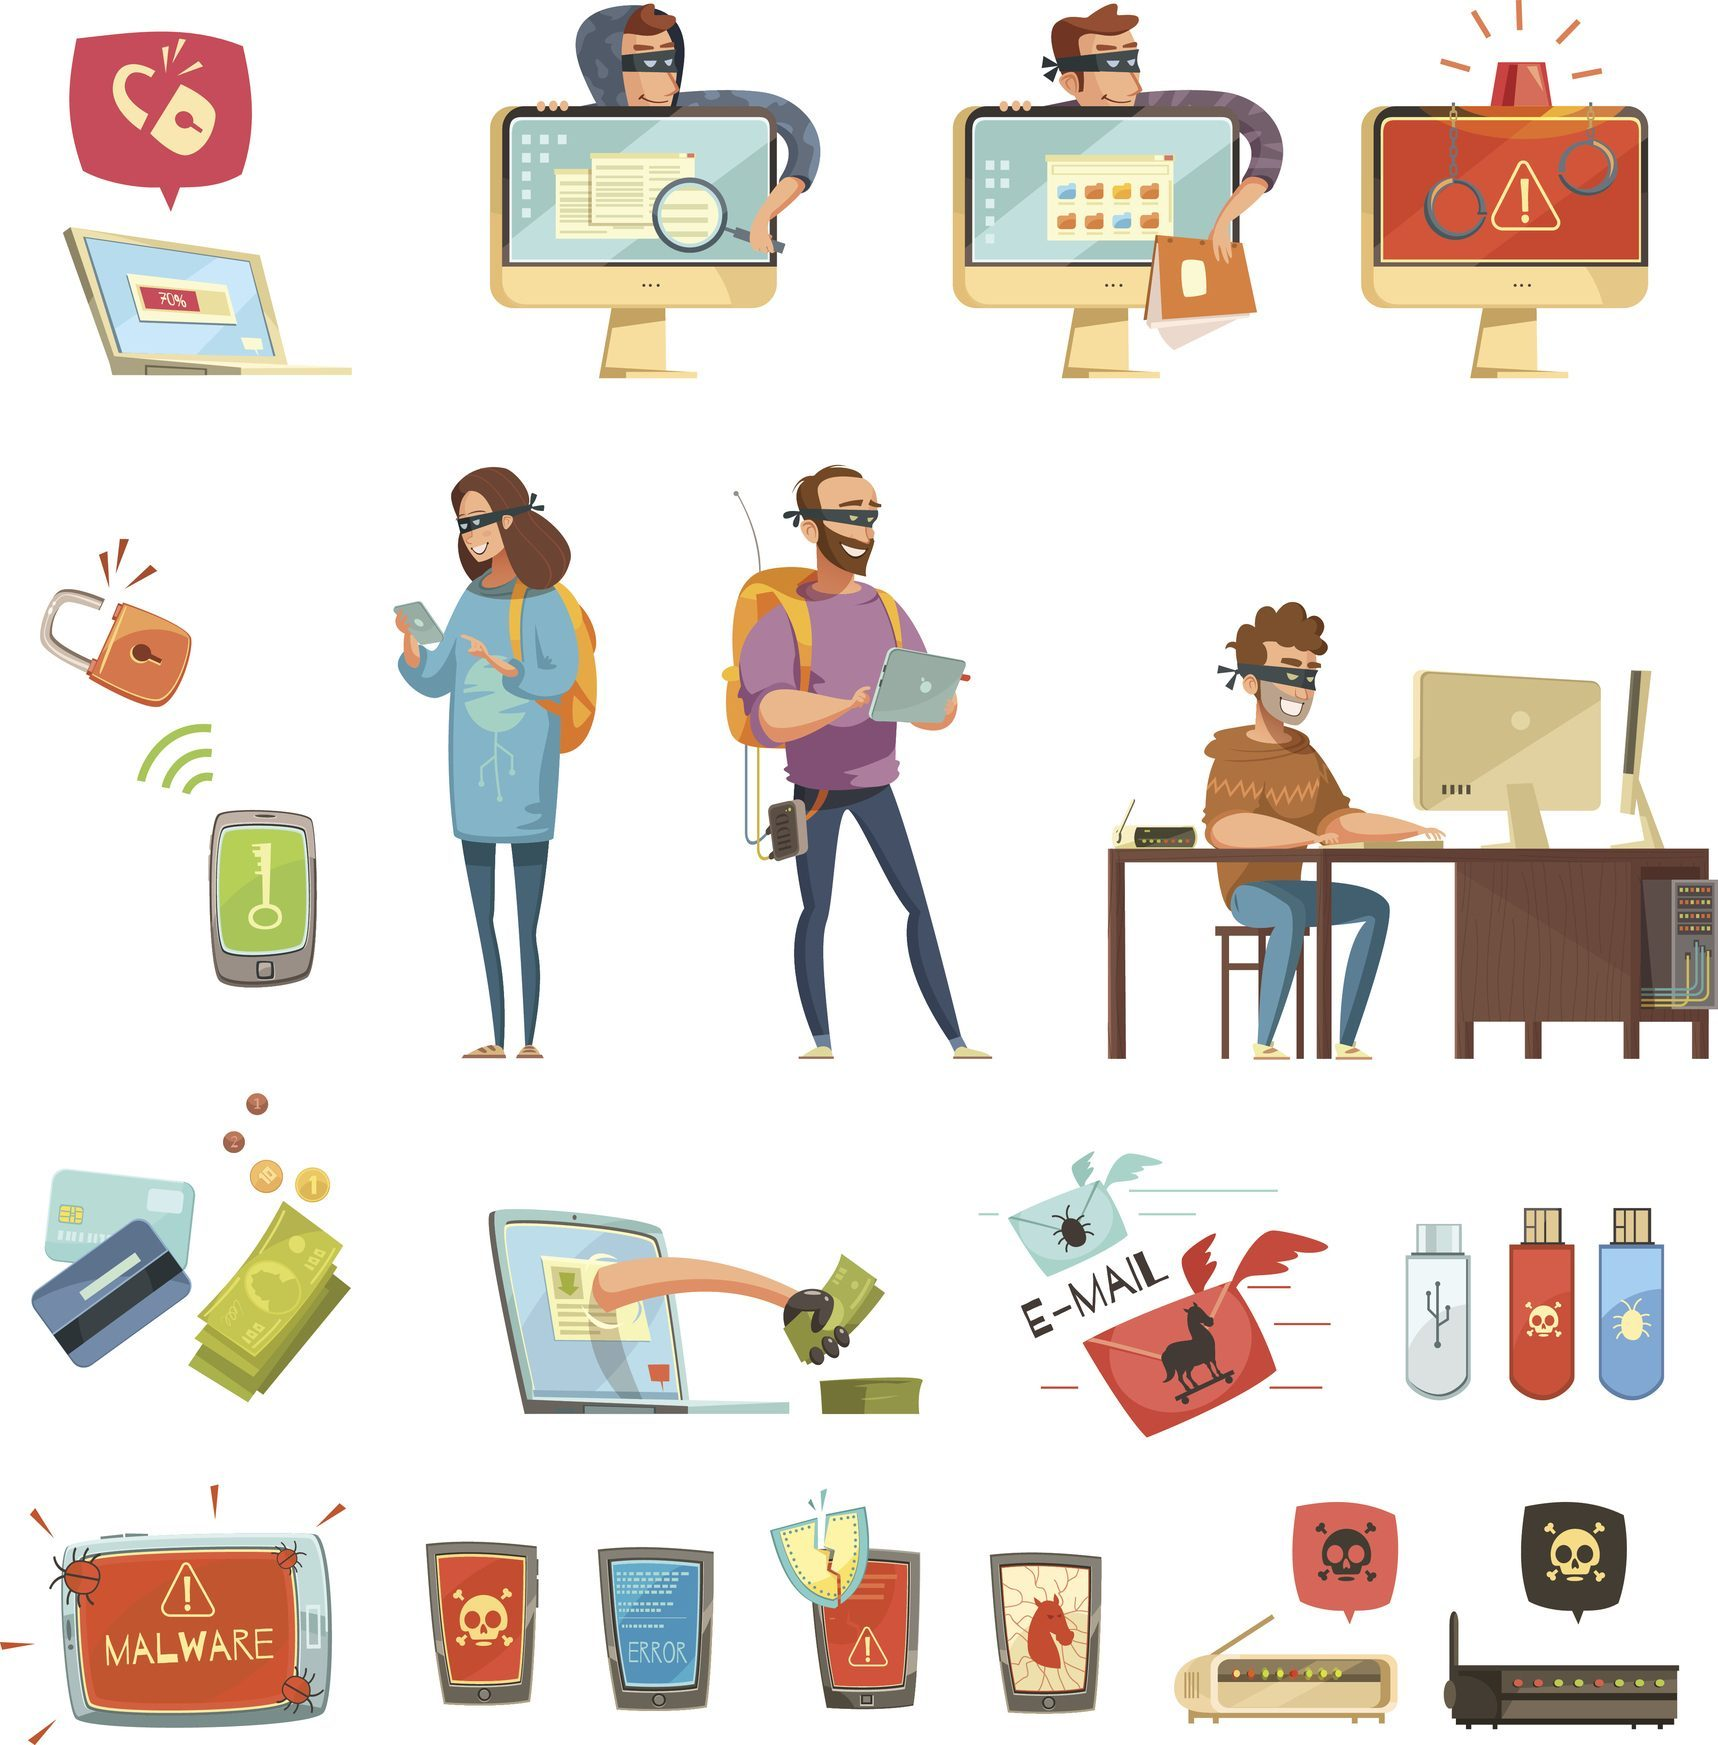 Hackers Activities Retro Cartoon Icons Set